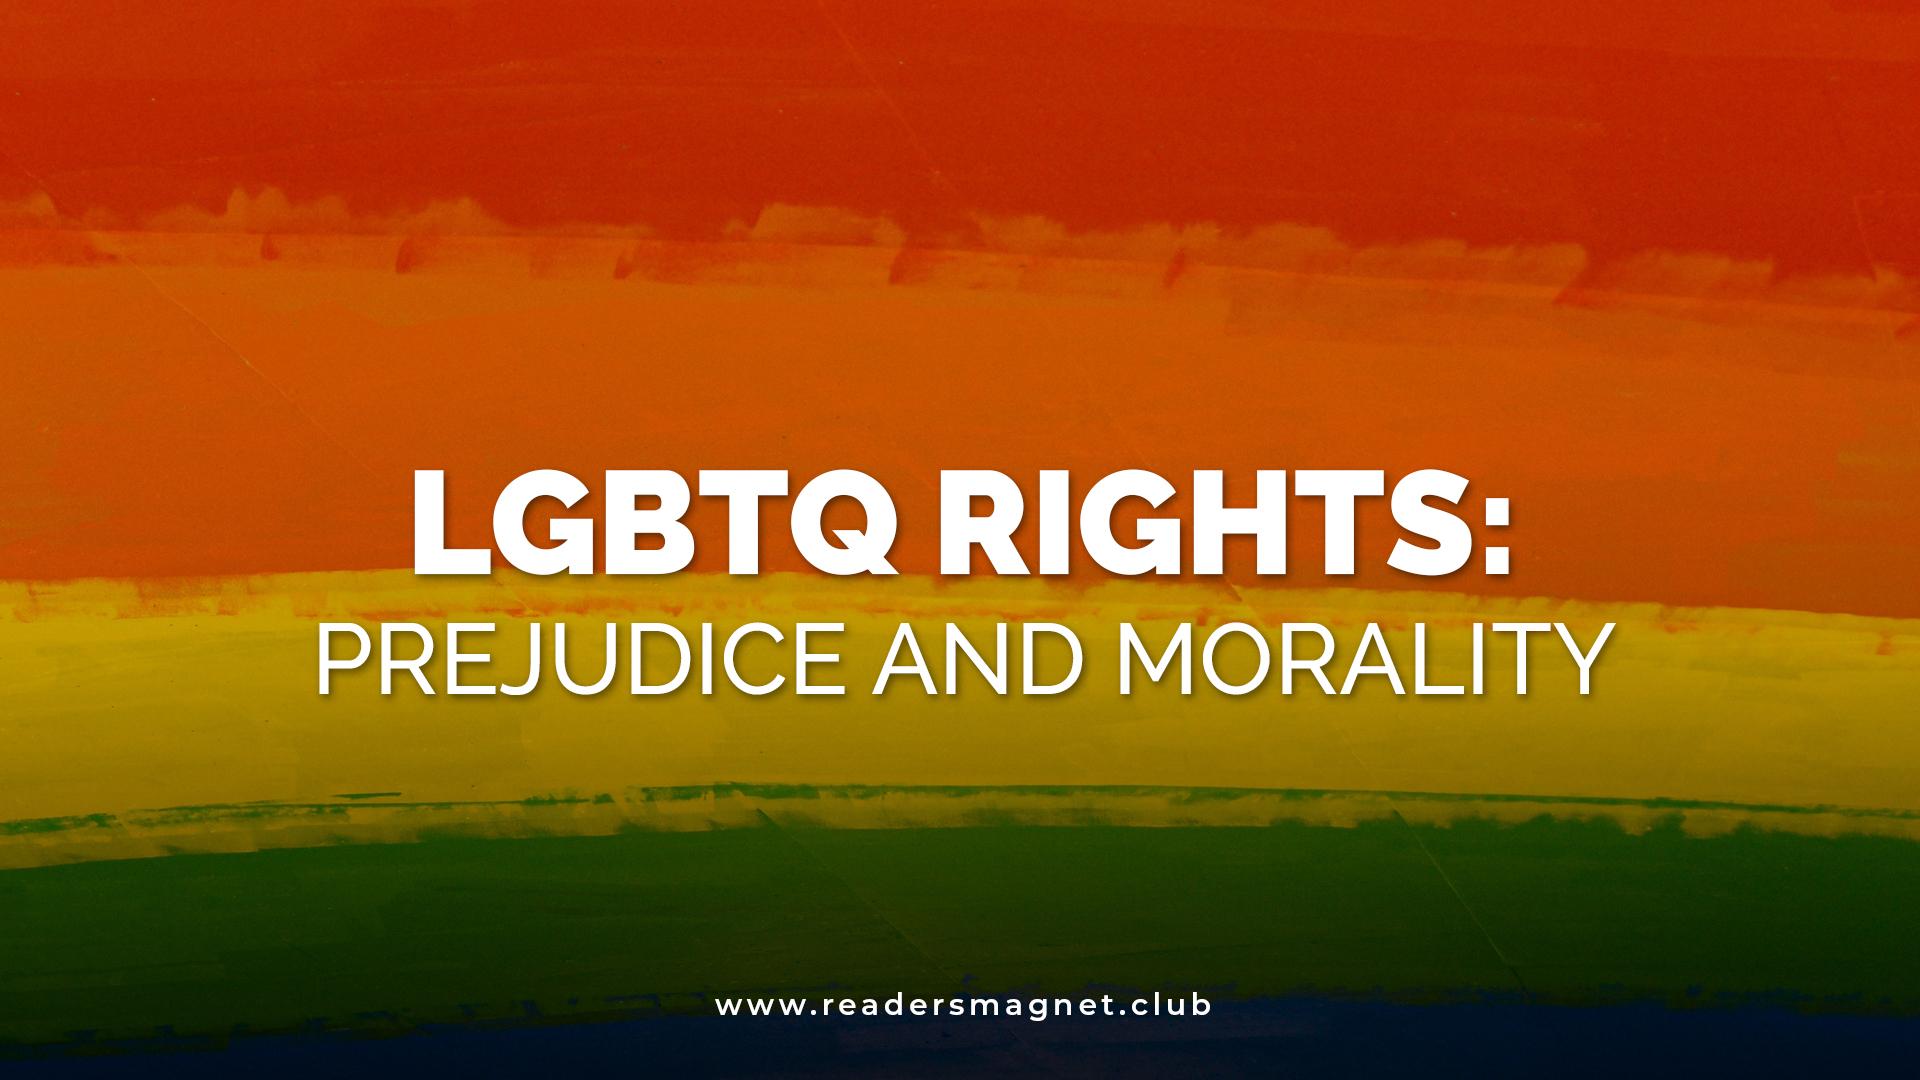 LGBTQ Rights Prejudice and Morality banner